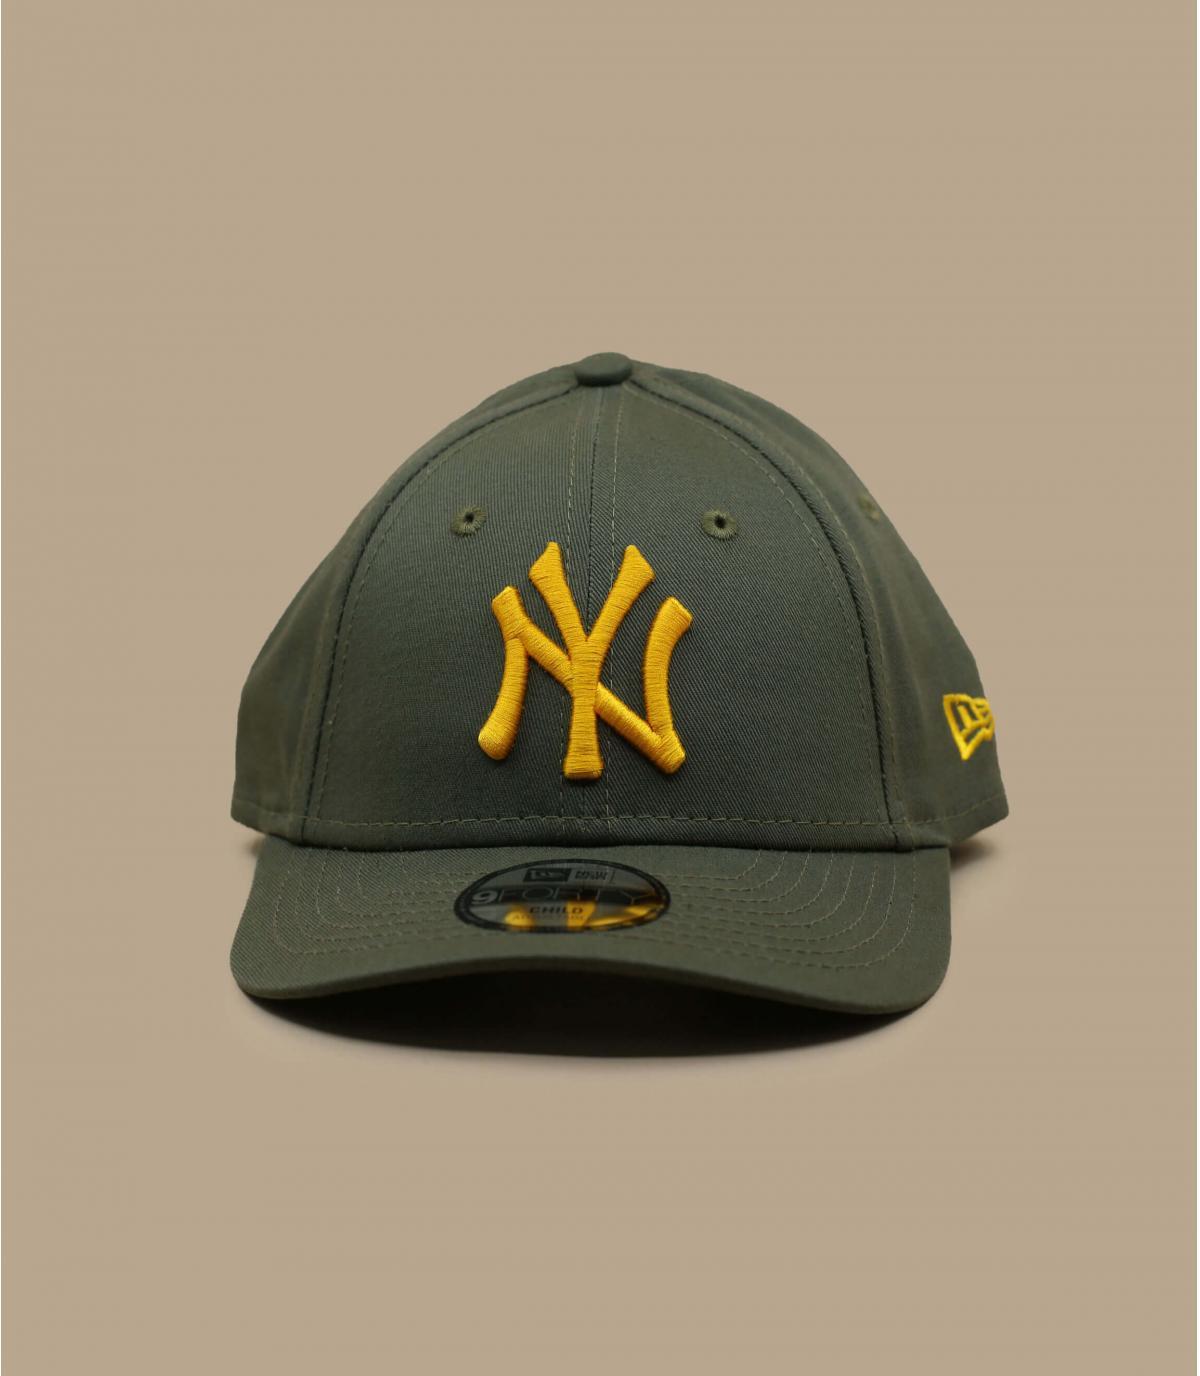 gorra infantil NY verde amarillo